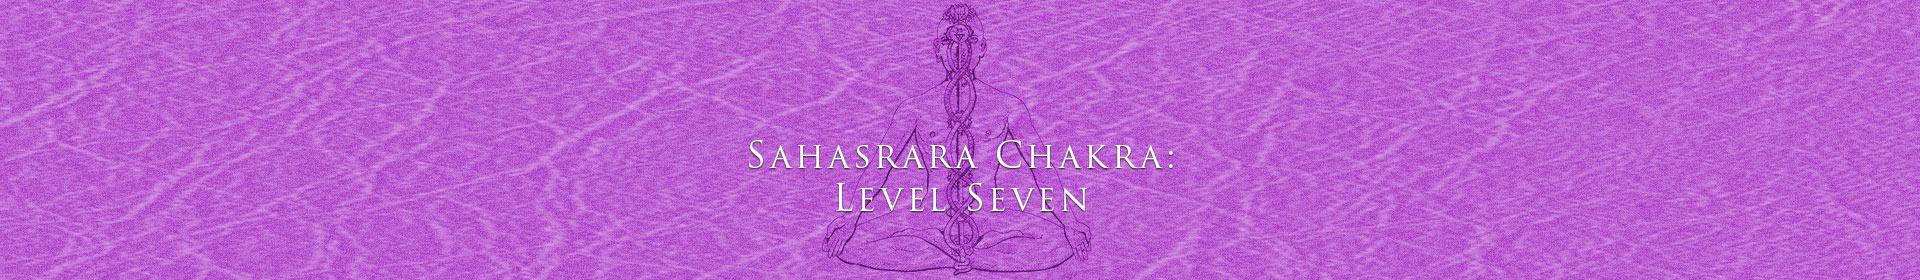 Sahasrara Chakra: Level Seven